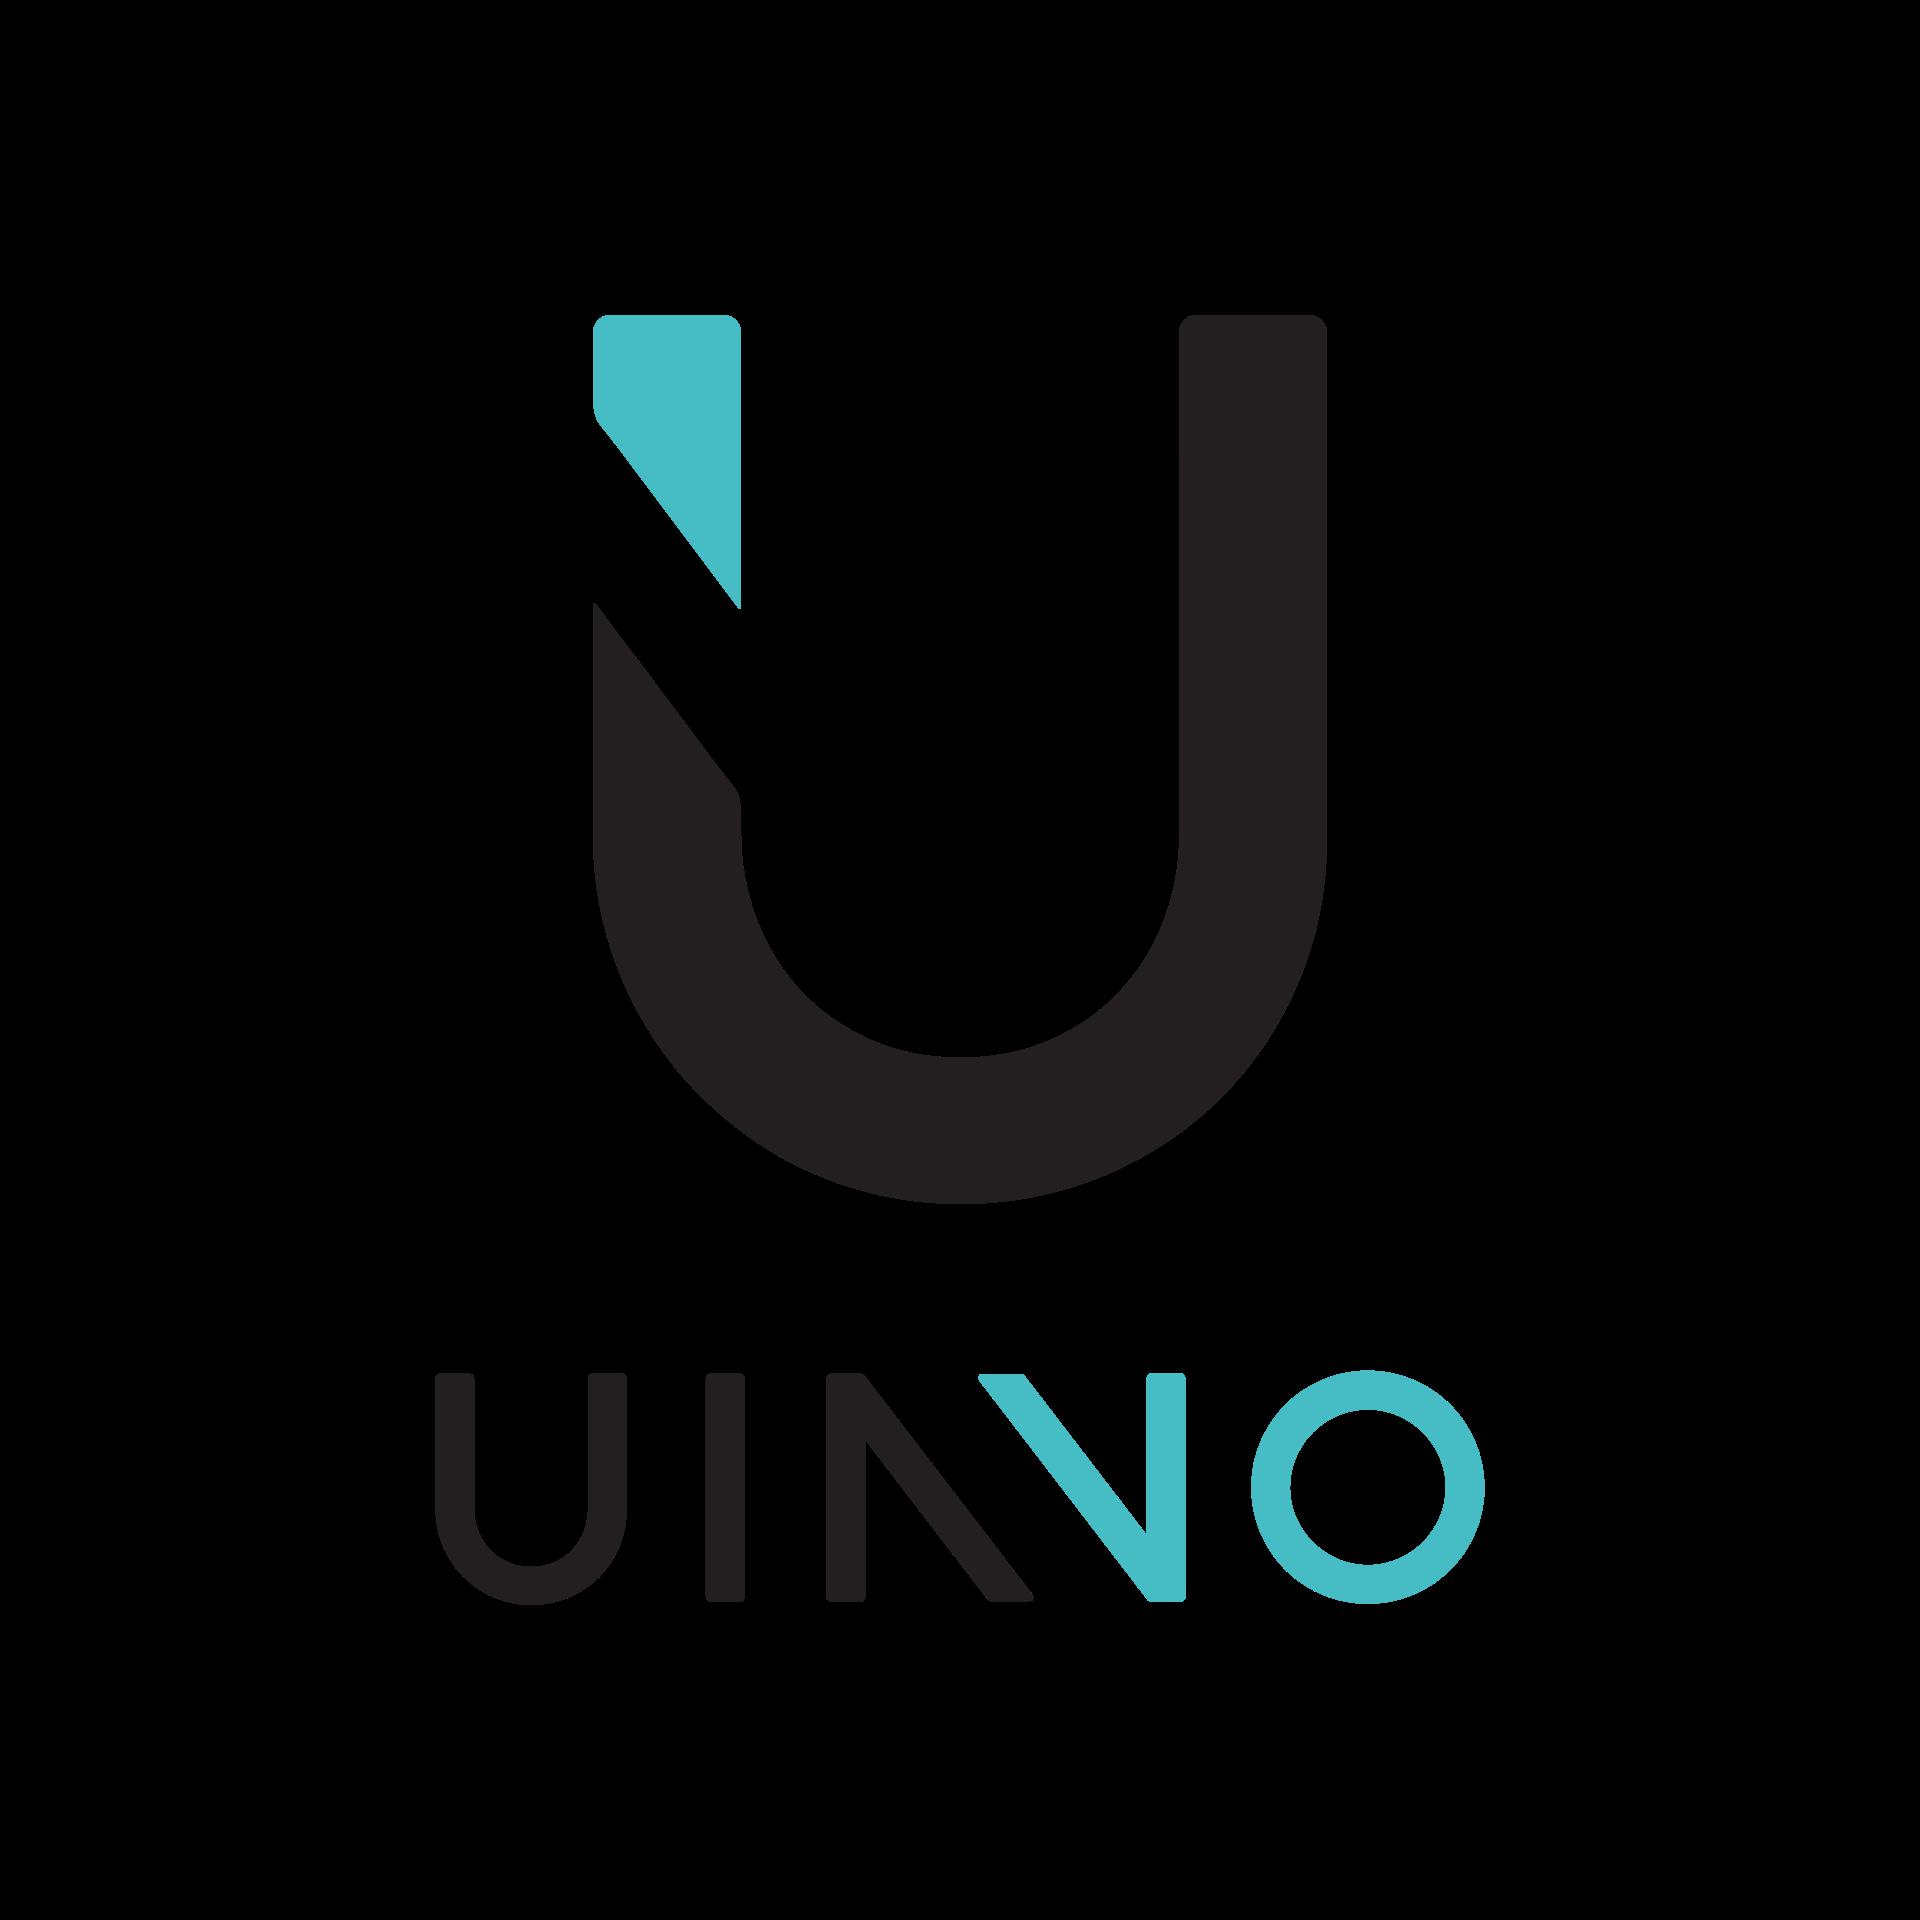 Uinno Logo